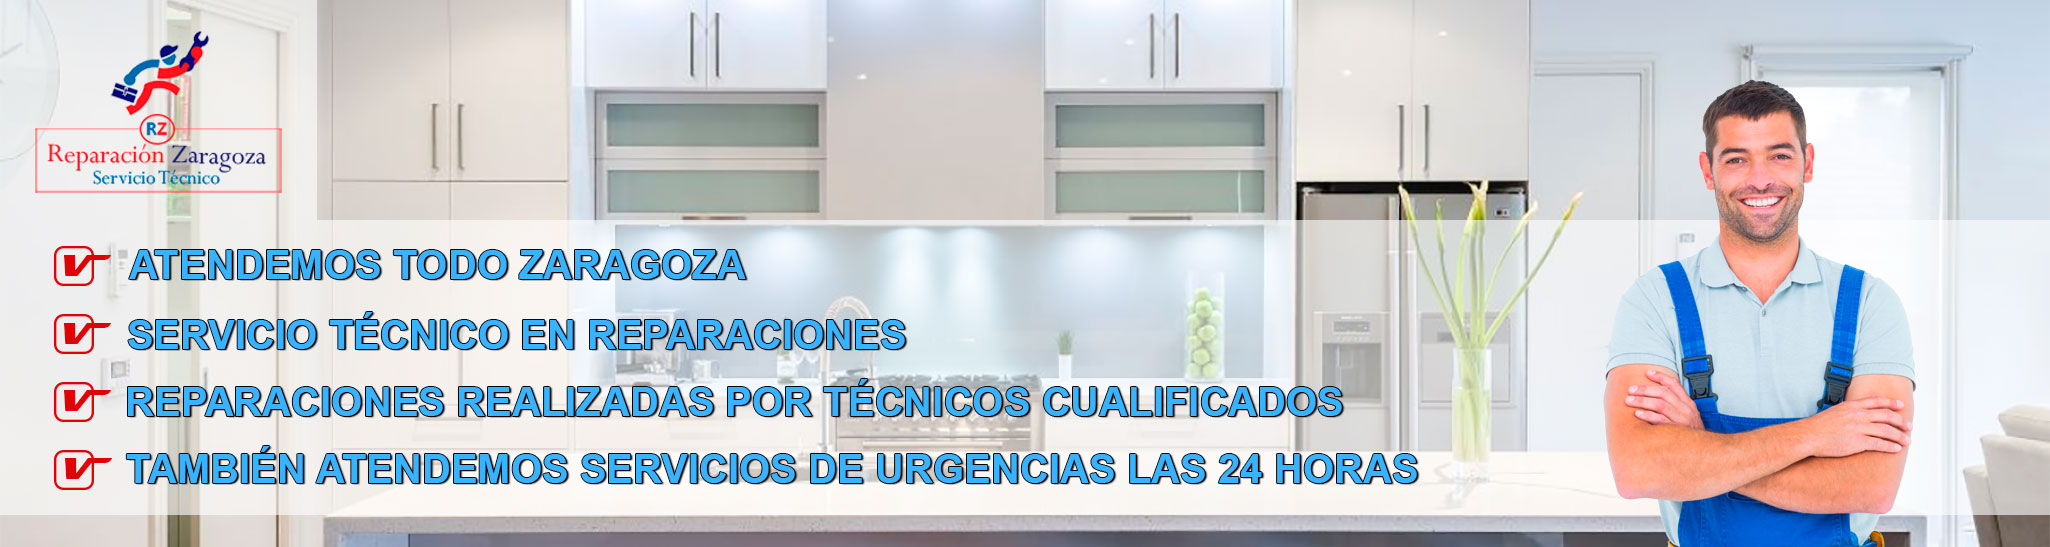 Reparaci n electrodom sticos zaragoza rz servicio t cnico for Reparacion calderas zaragoza